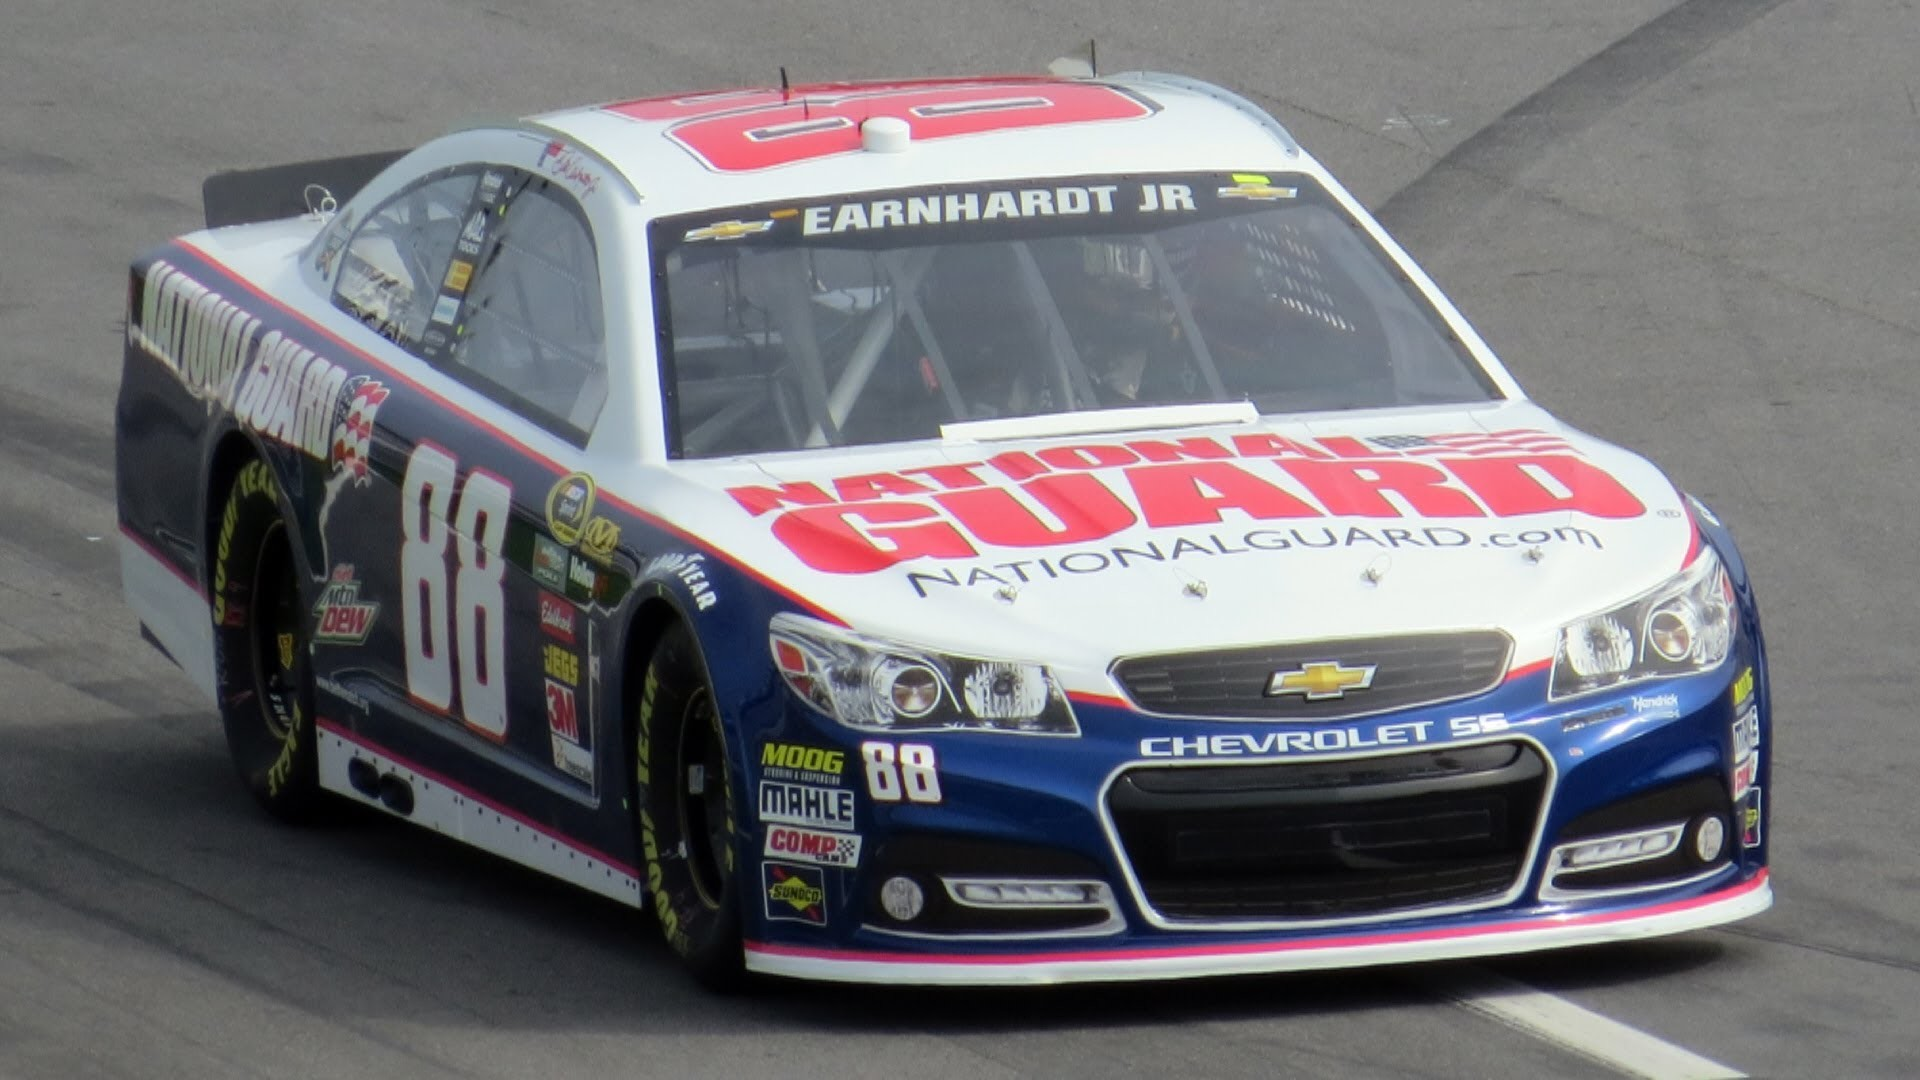 Dale Earnhardt Jr. – Daytona 500 2013 Practice Laps on Track Before  Qualifying